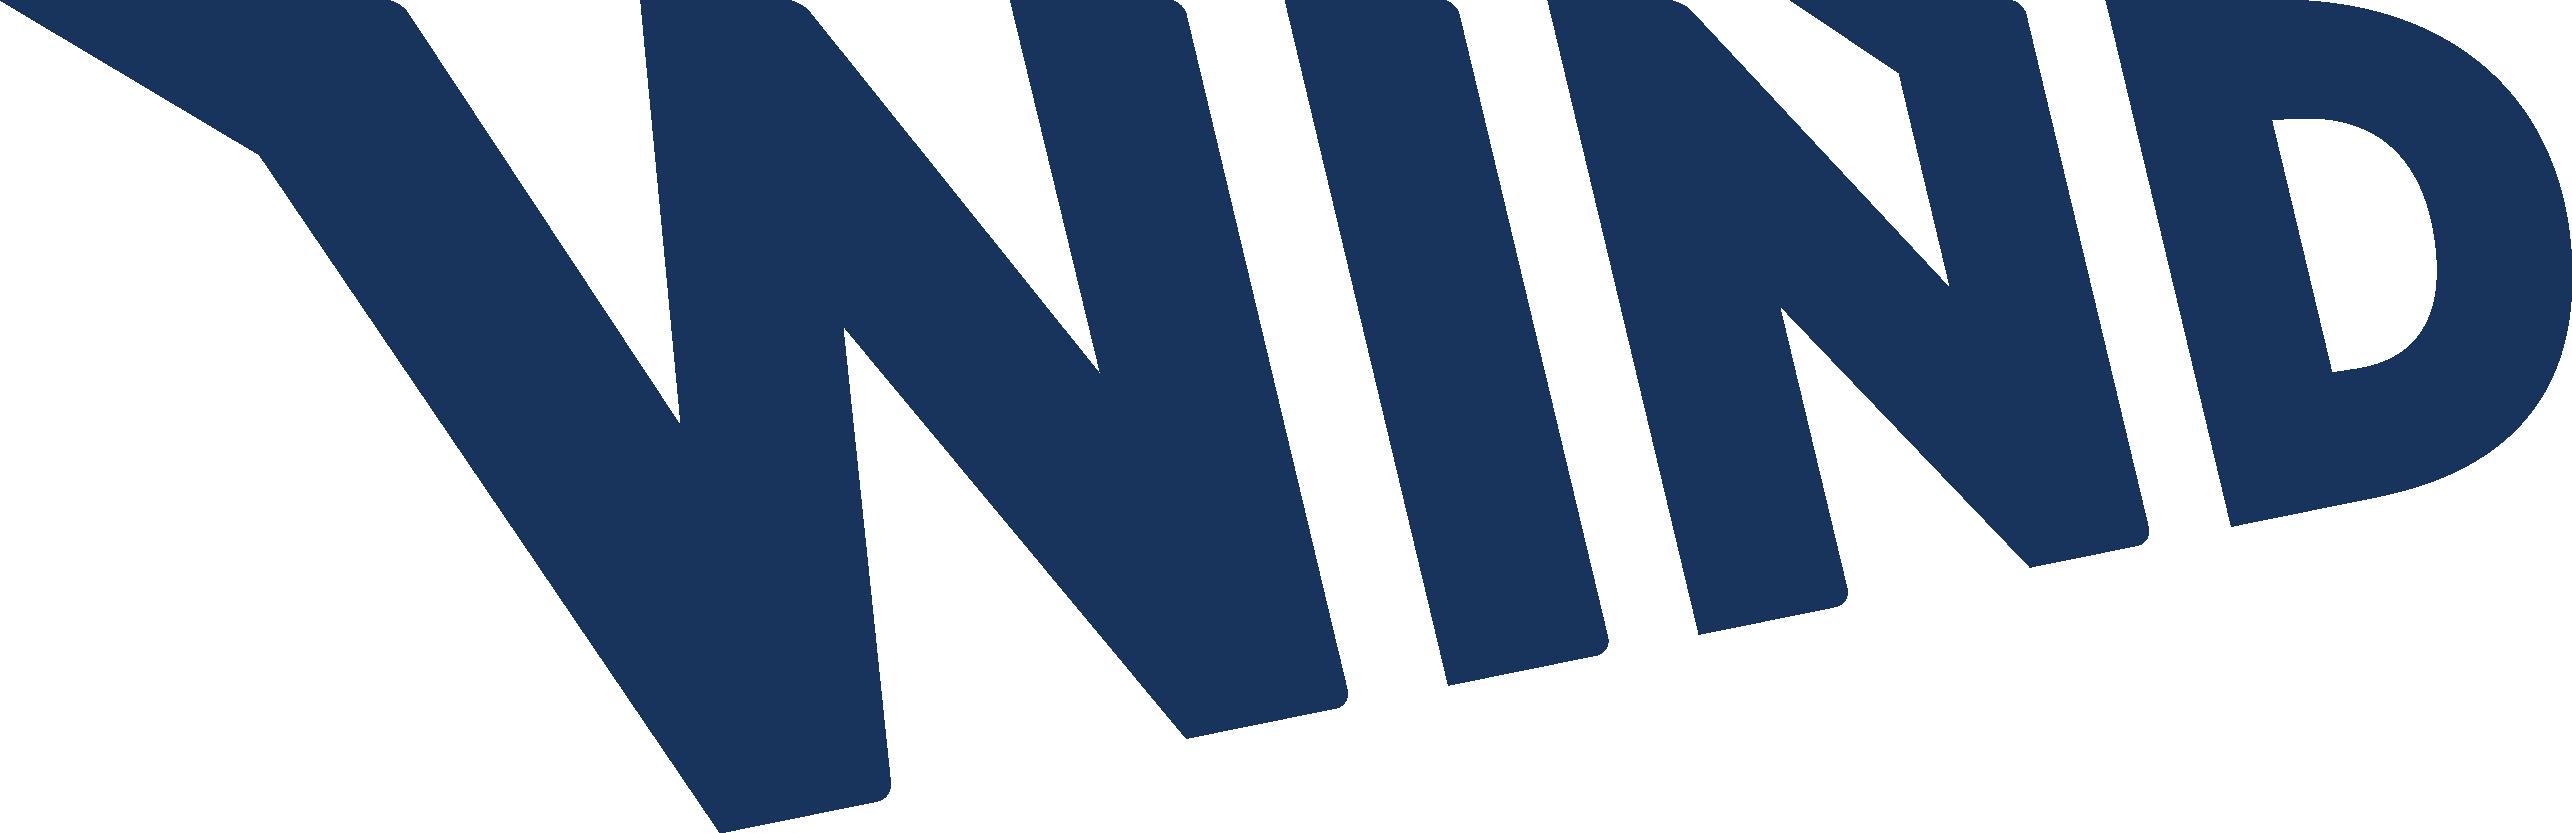 Wind Mobility logo